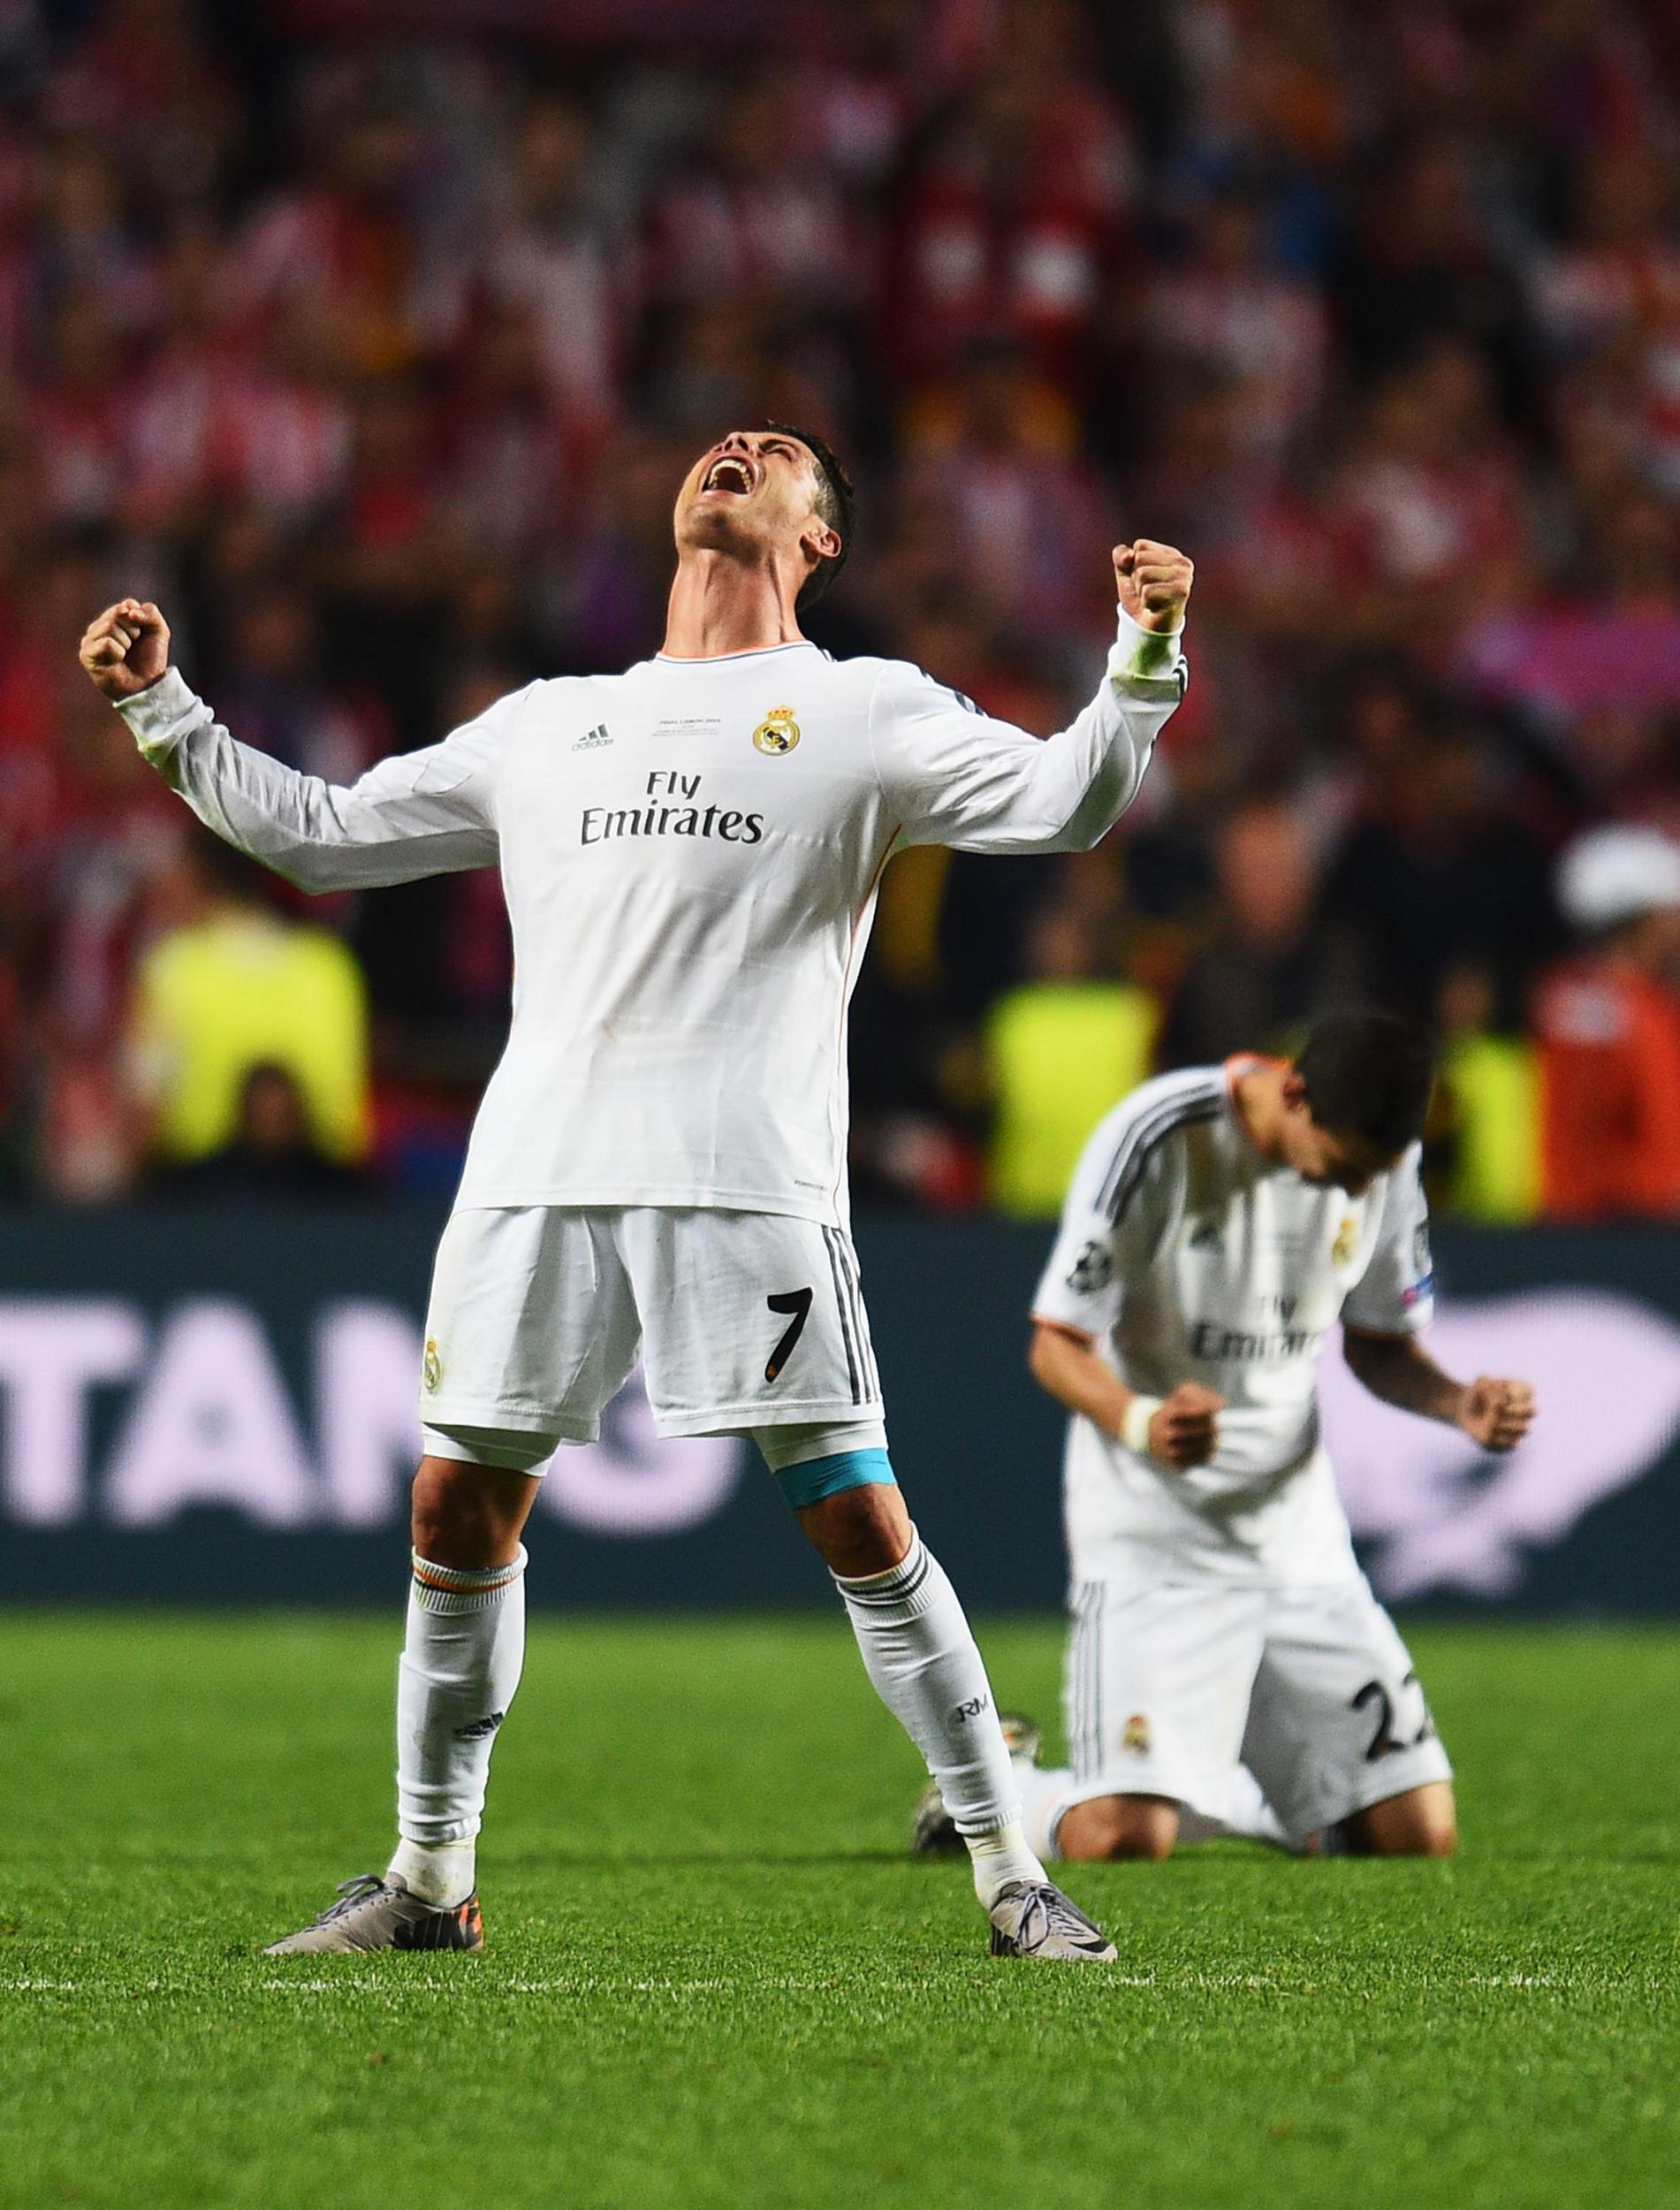 Image: Real Madrid v Atletico de Madrid - UEFA Champions League Final